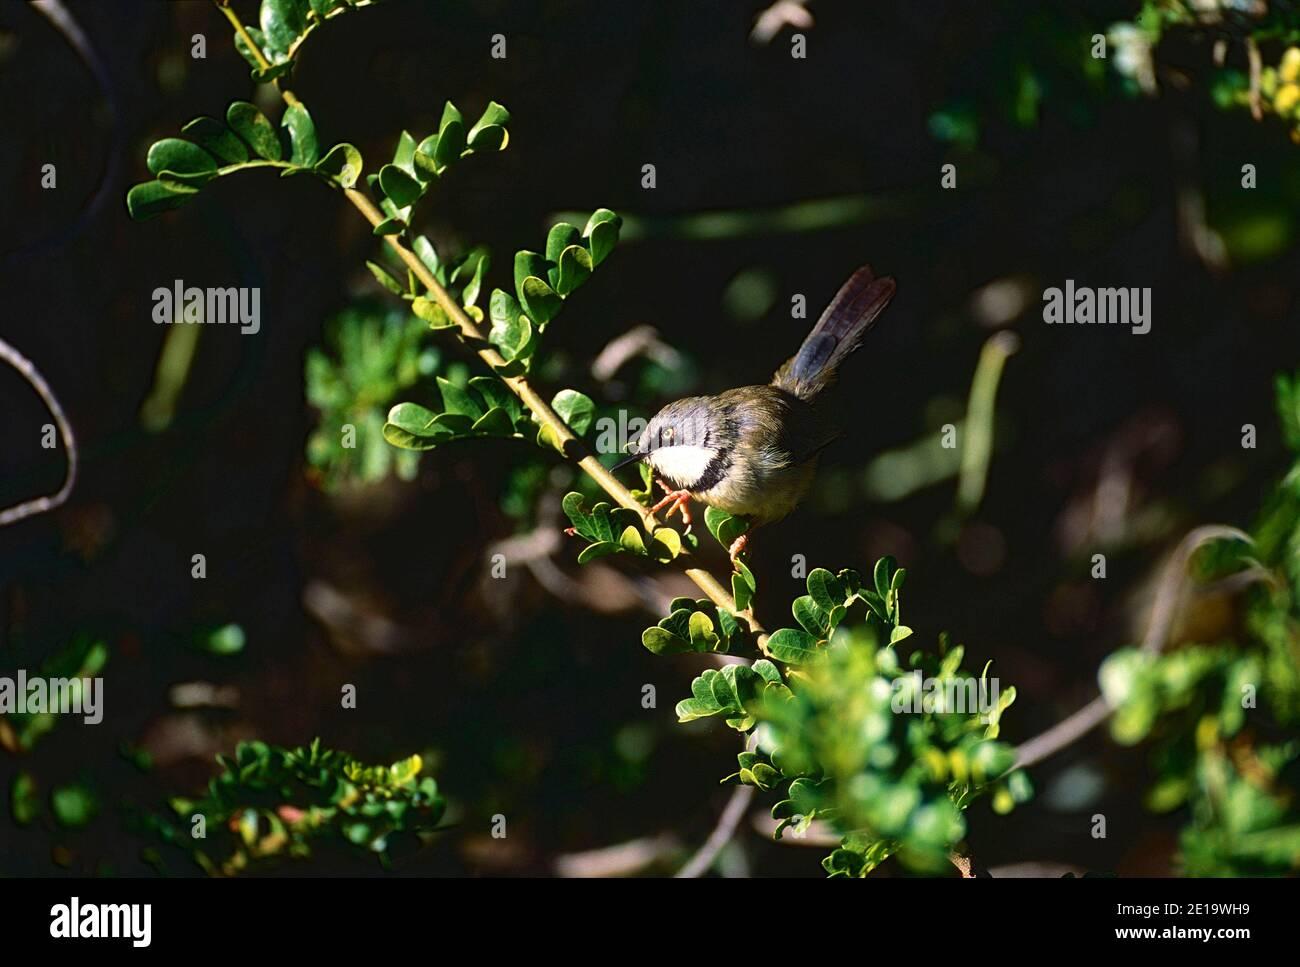 Apalis Barthroated, Apalis thoracia, Cisticolidae, aves, animales, Parque Nacional de elefantes Addo, Sudáfrica Foto de stock